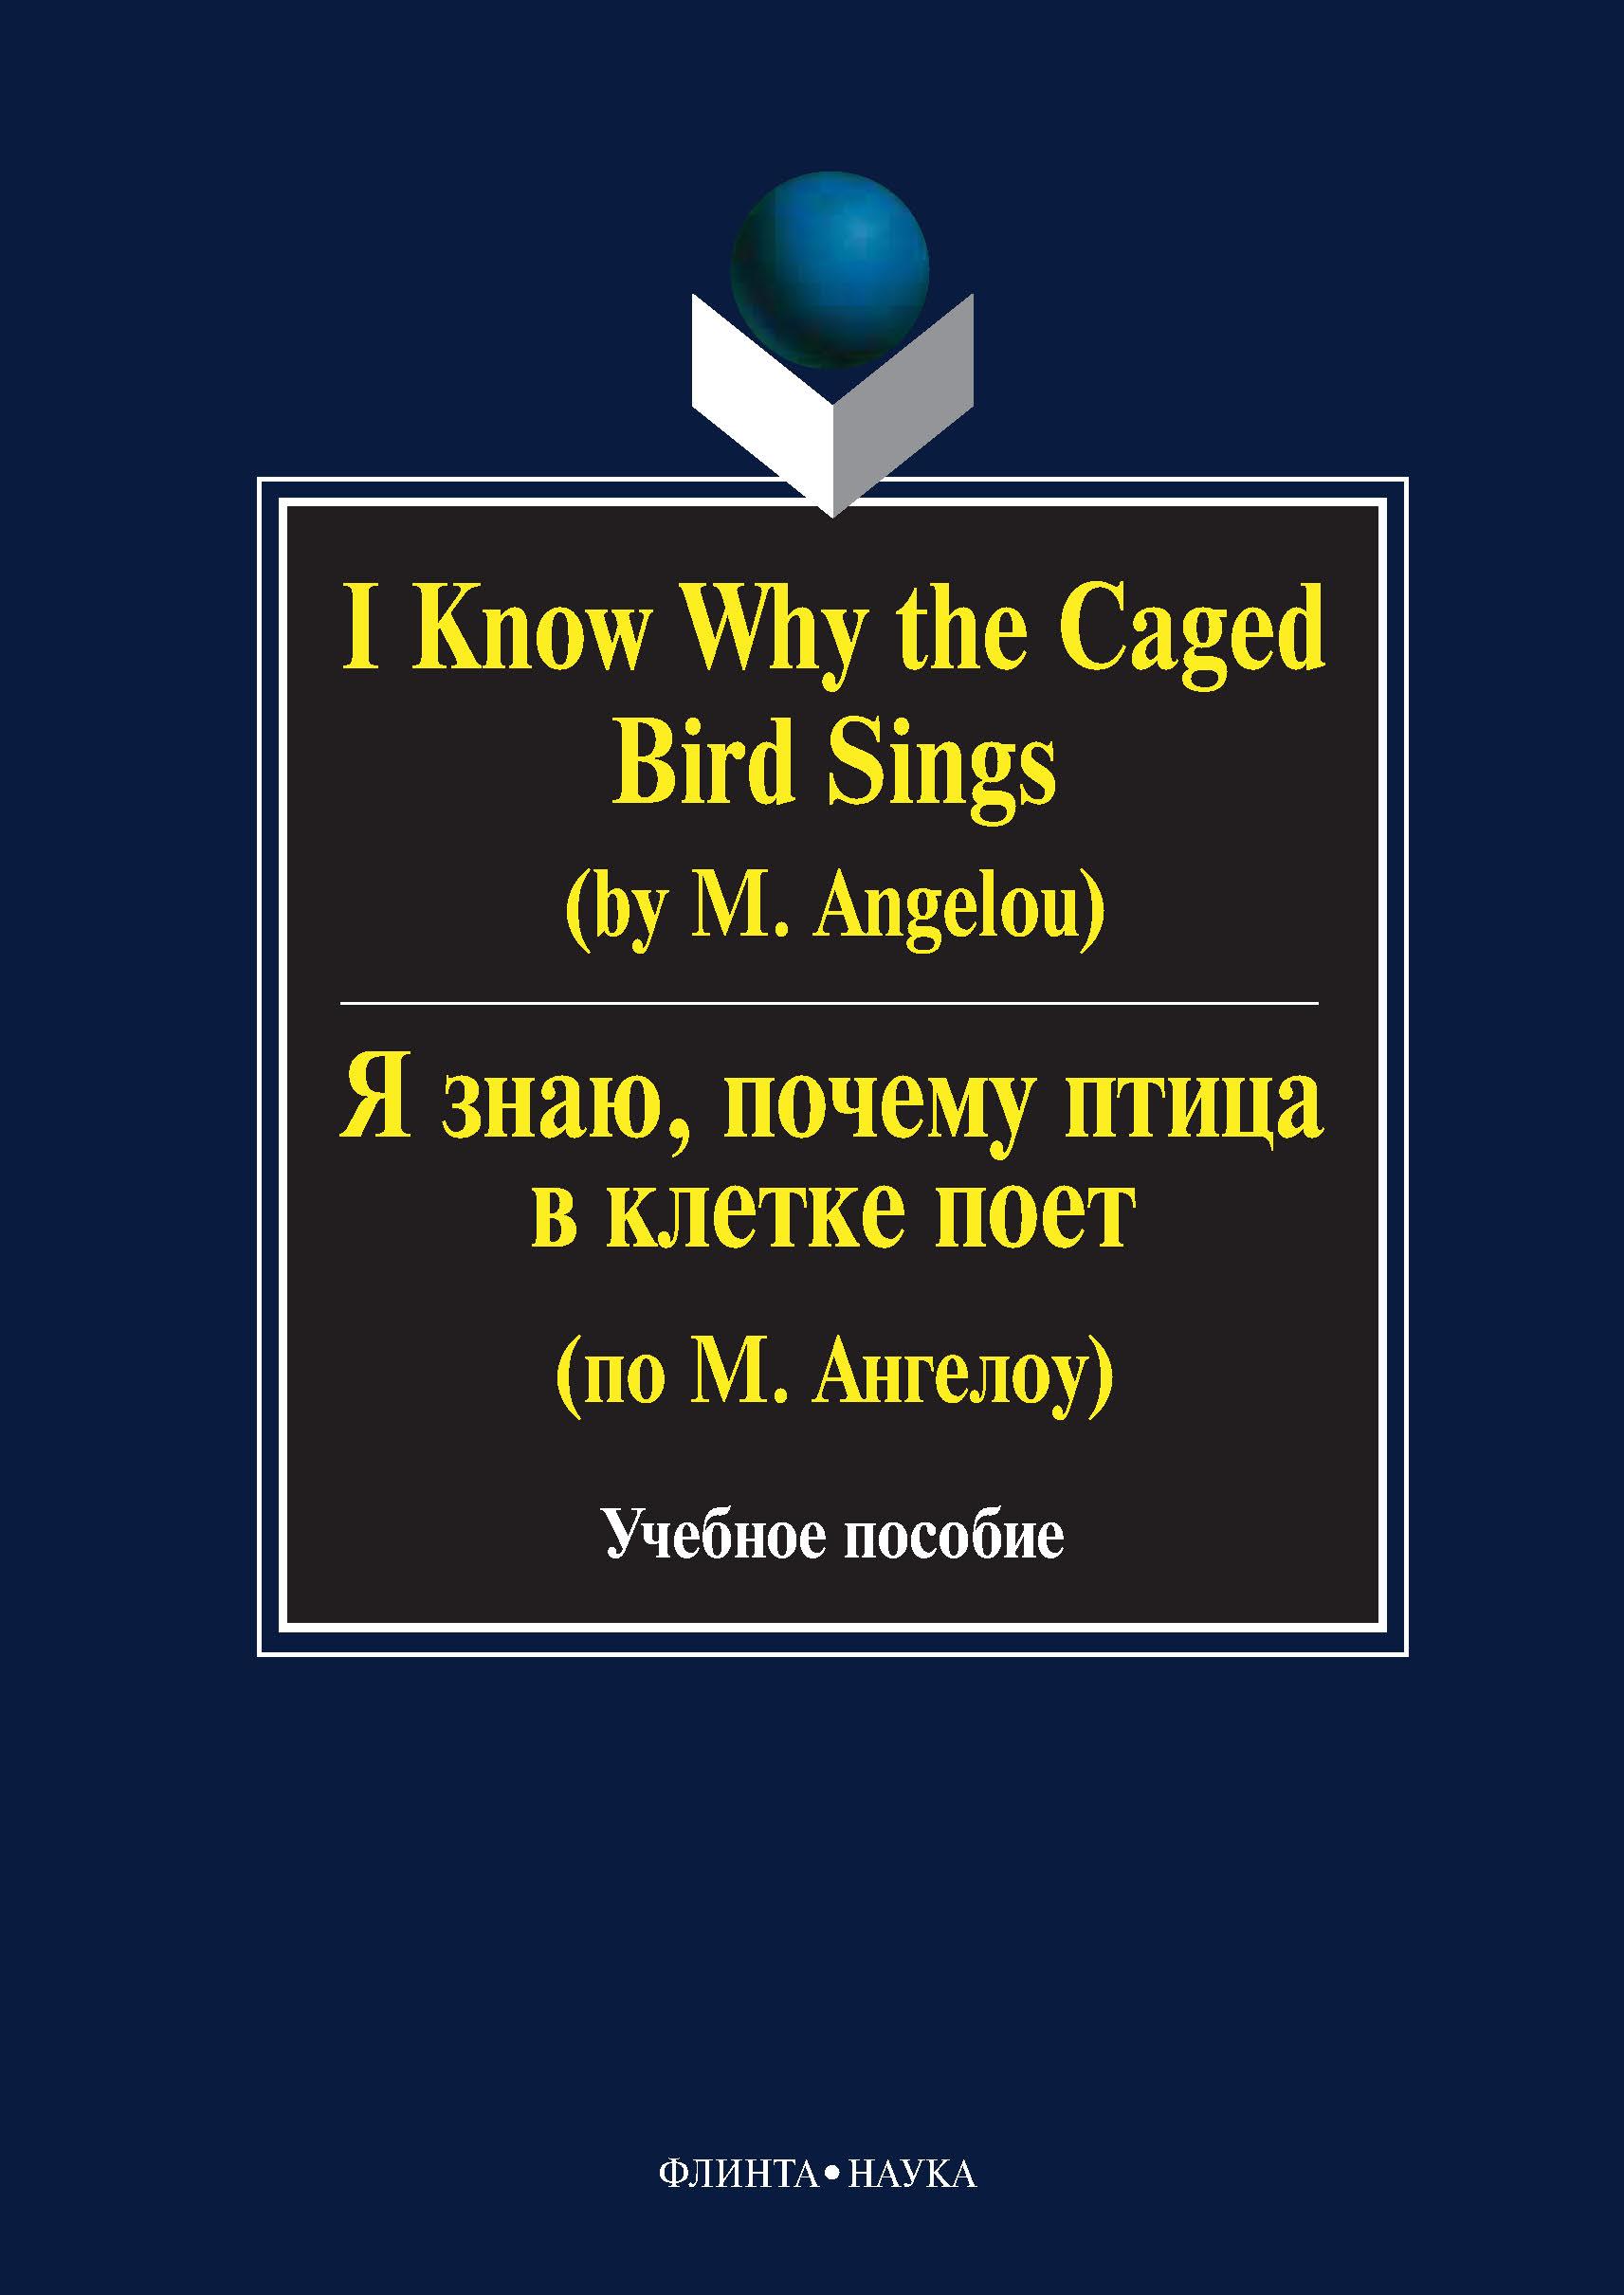 Г. Н. Бабич I Know Why the Caged Bird Sings (by M. Angelou) / Я знаю, почему птица в клетке поет (по М. Ангелоу). Учебное пособие caged back swimsuit